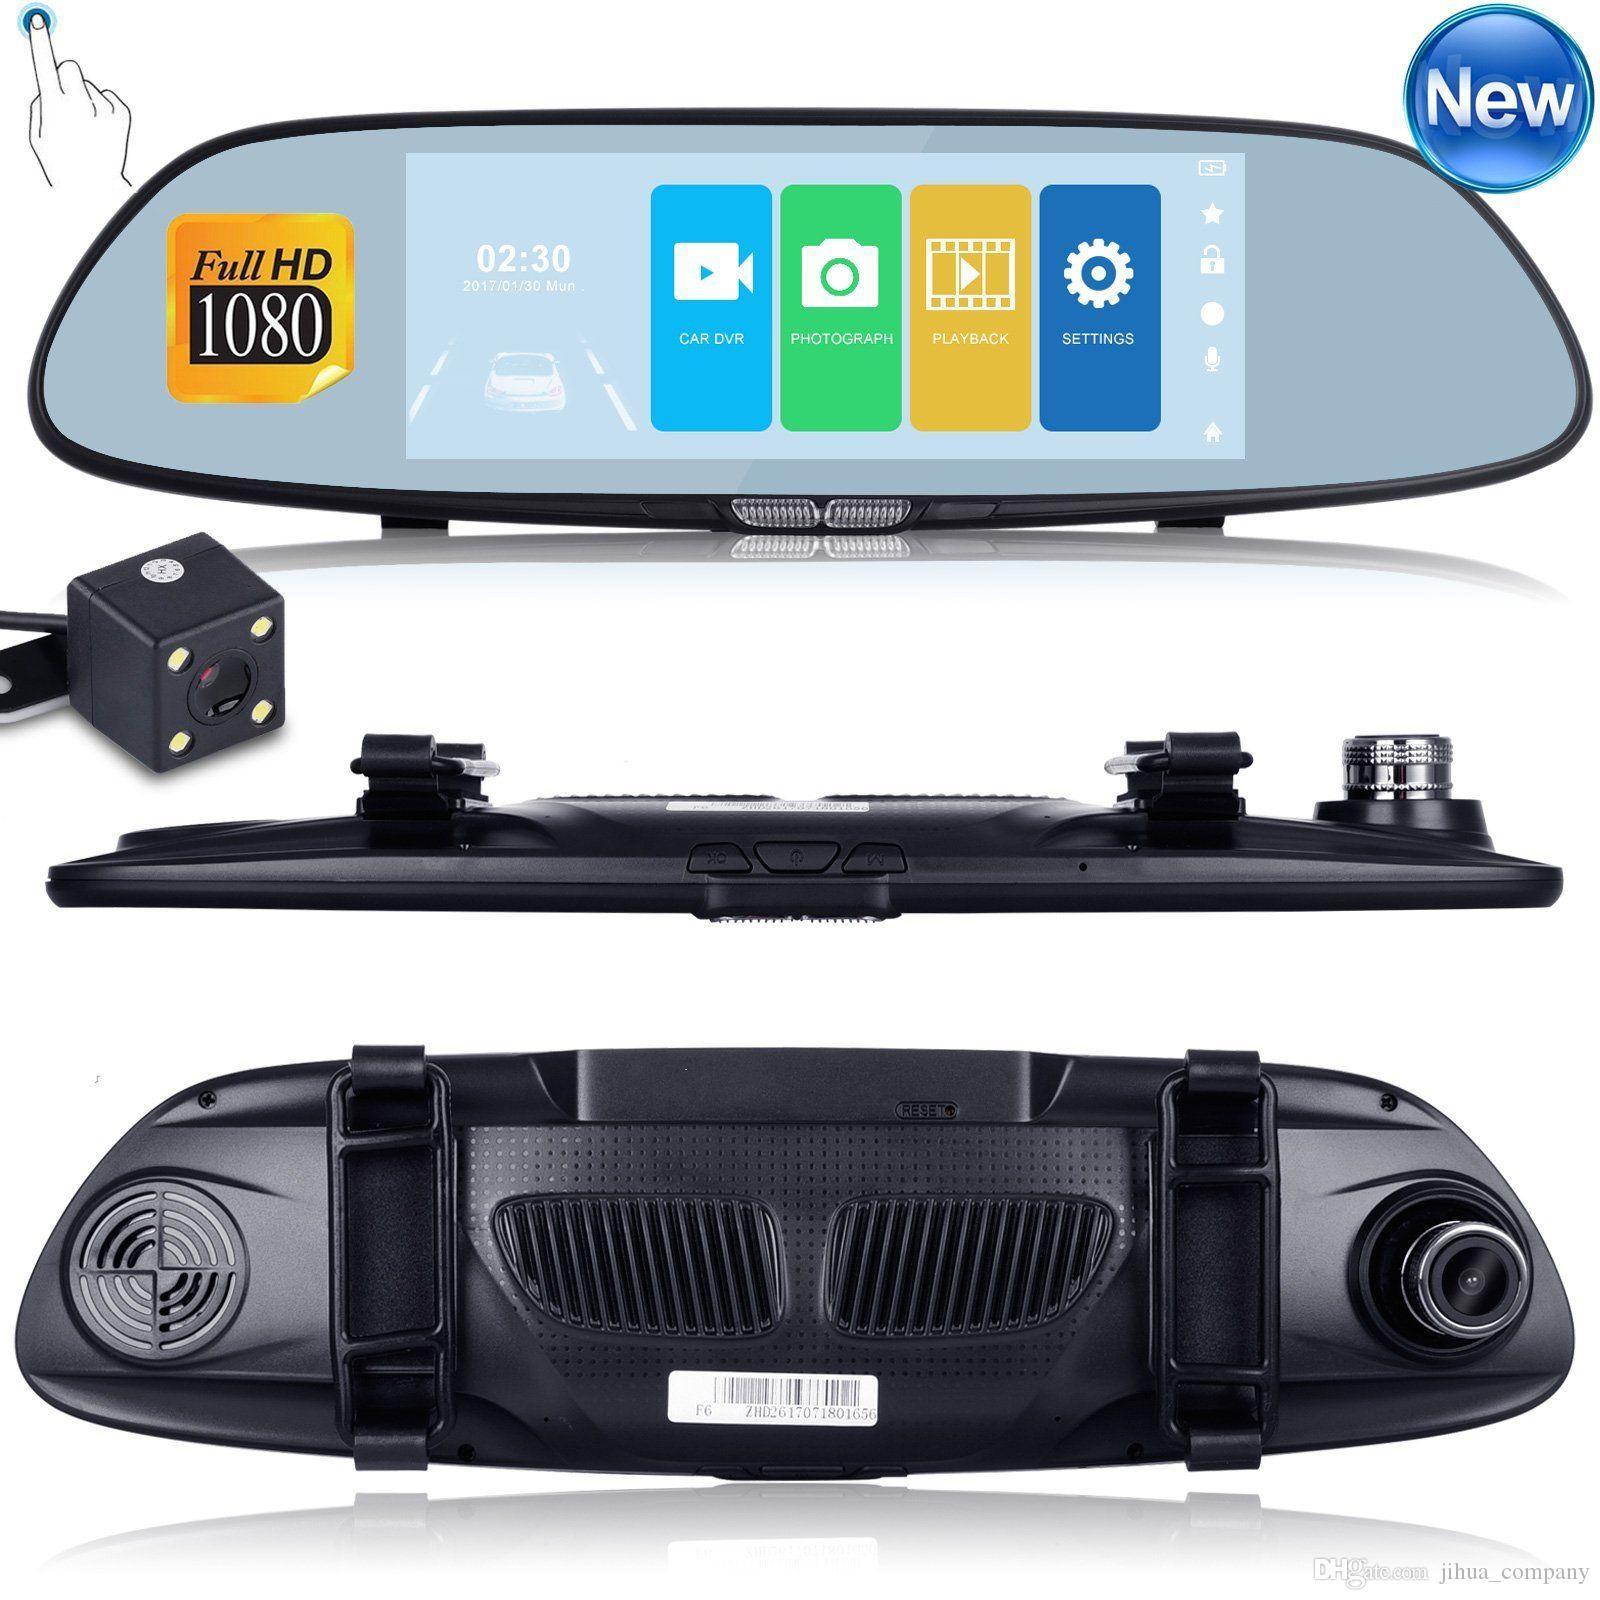 New High Quality HD 1080P 7'' Car DVR Video Recorder G-sensor Dash Cam Rearview Mirror Camera DVR Free Shipping